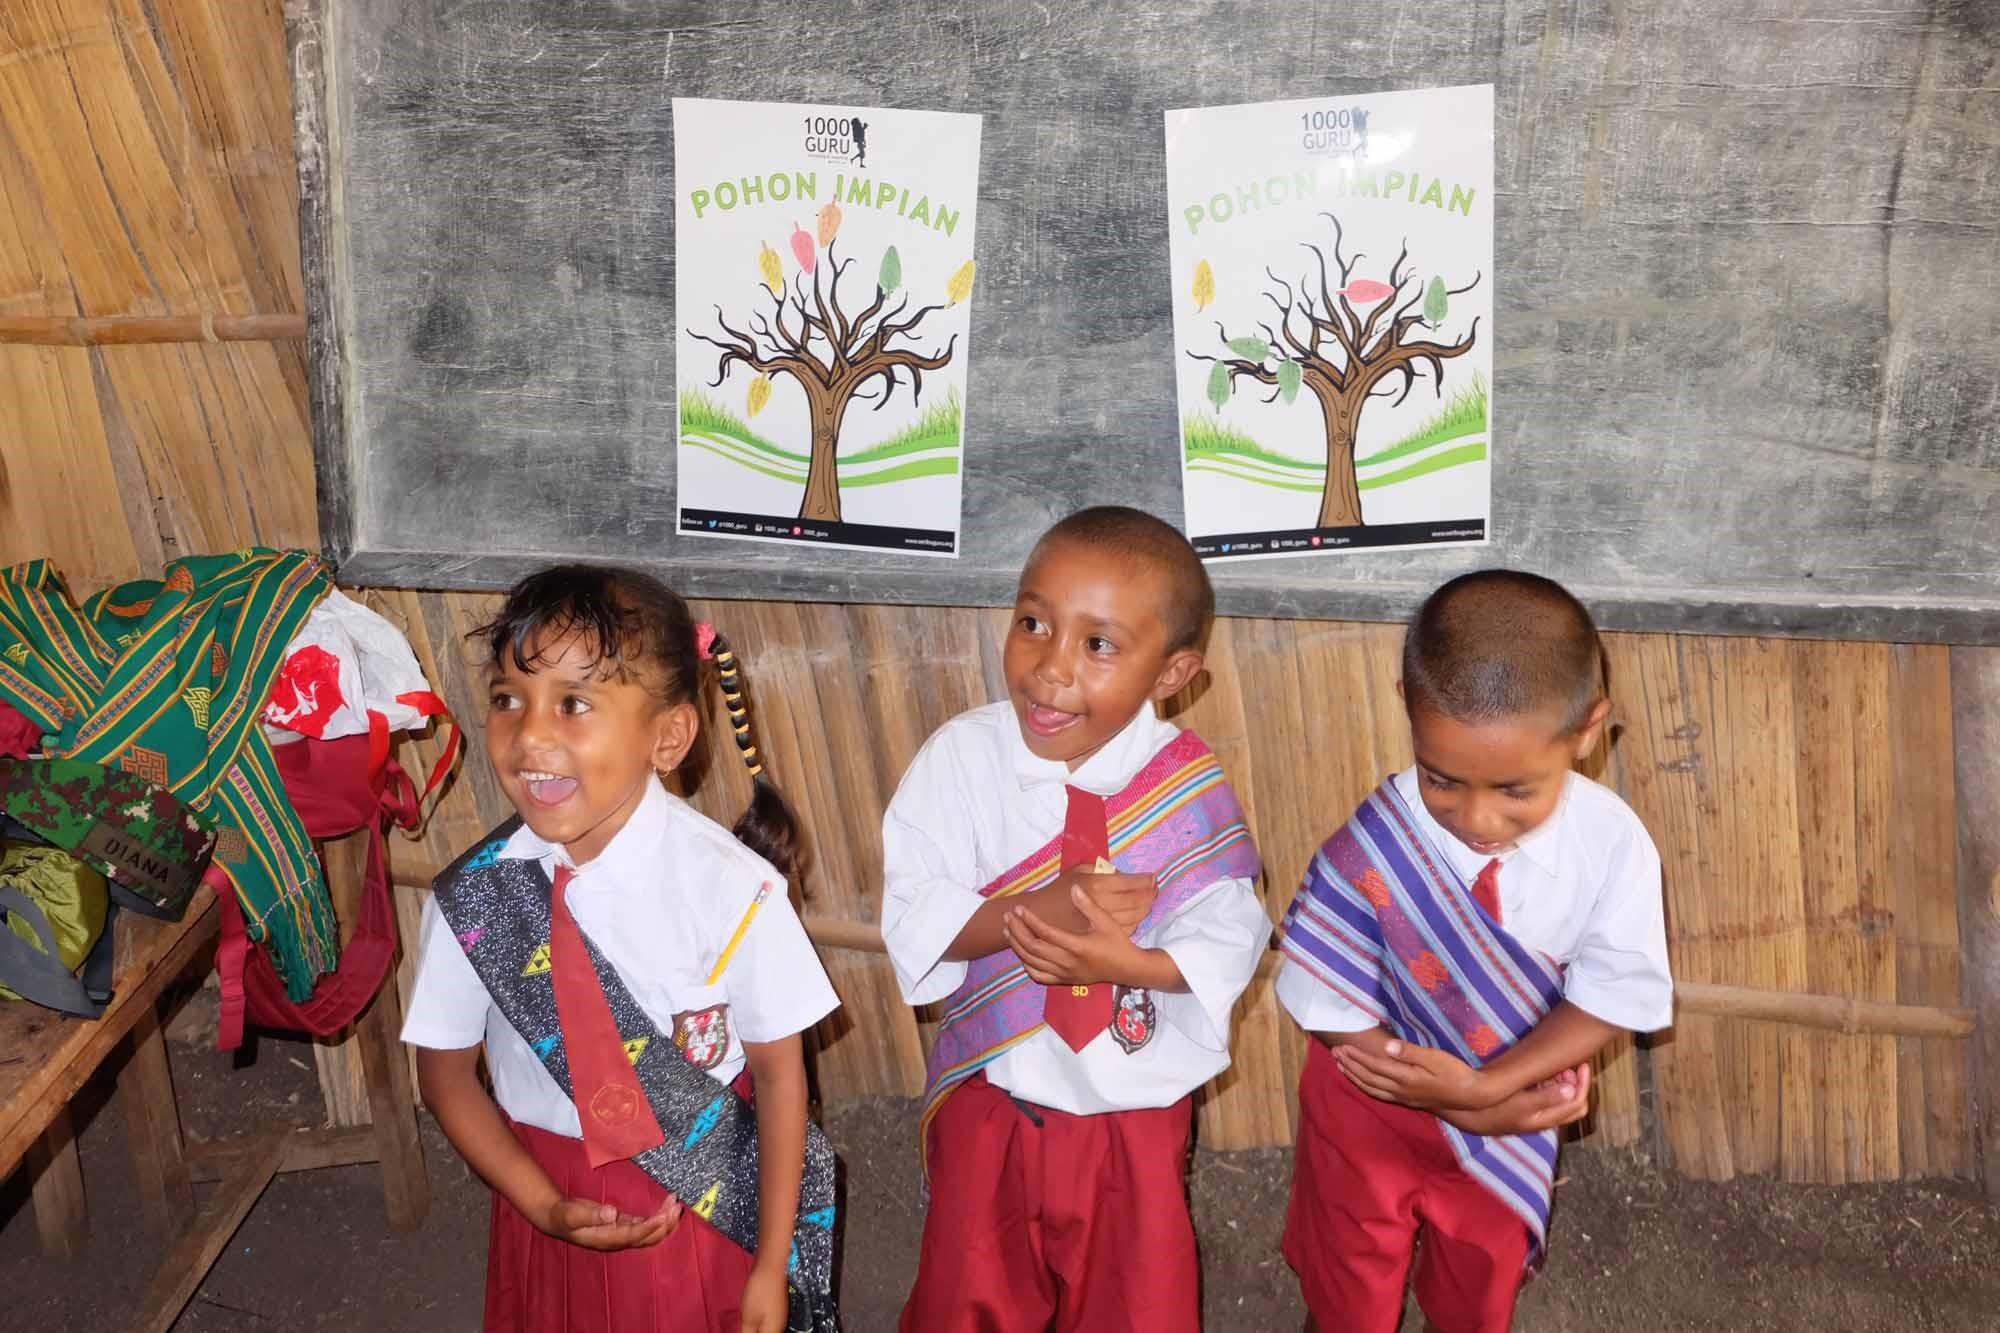 Anak-anak pedalaman Nusa Tenggara Timur yang selalu semangat menuntut ilmu walau kondisi sekolah dan kelas yang seadanya.